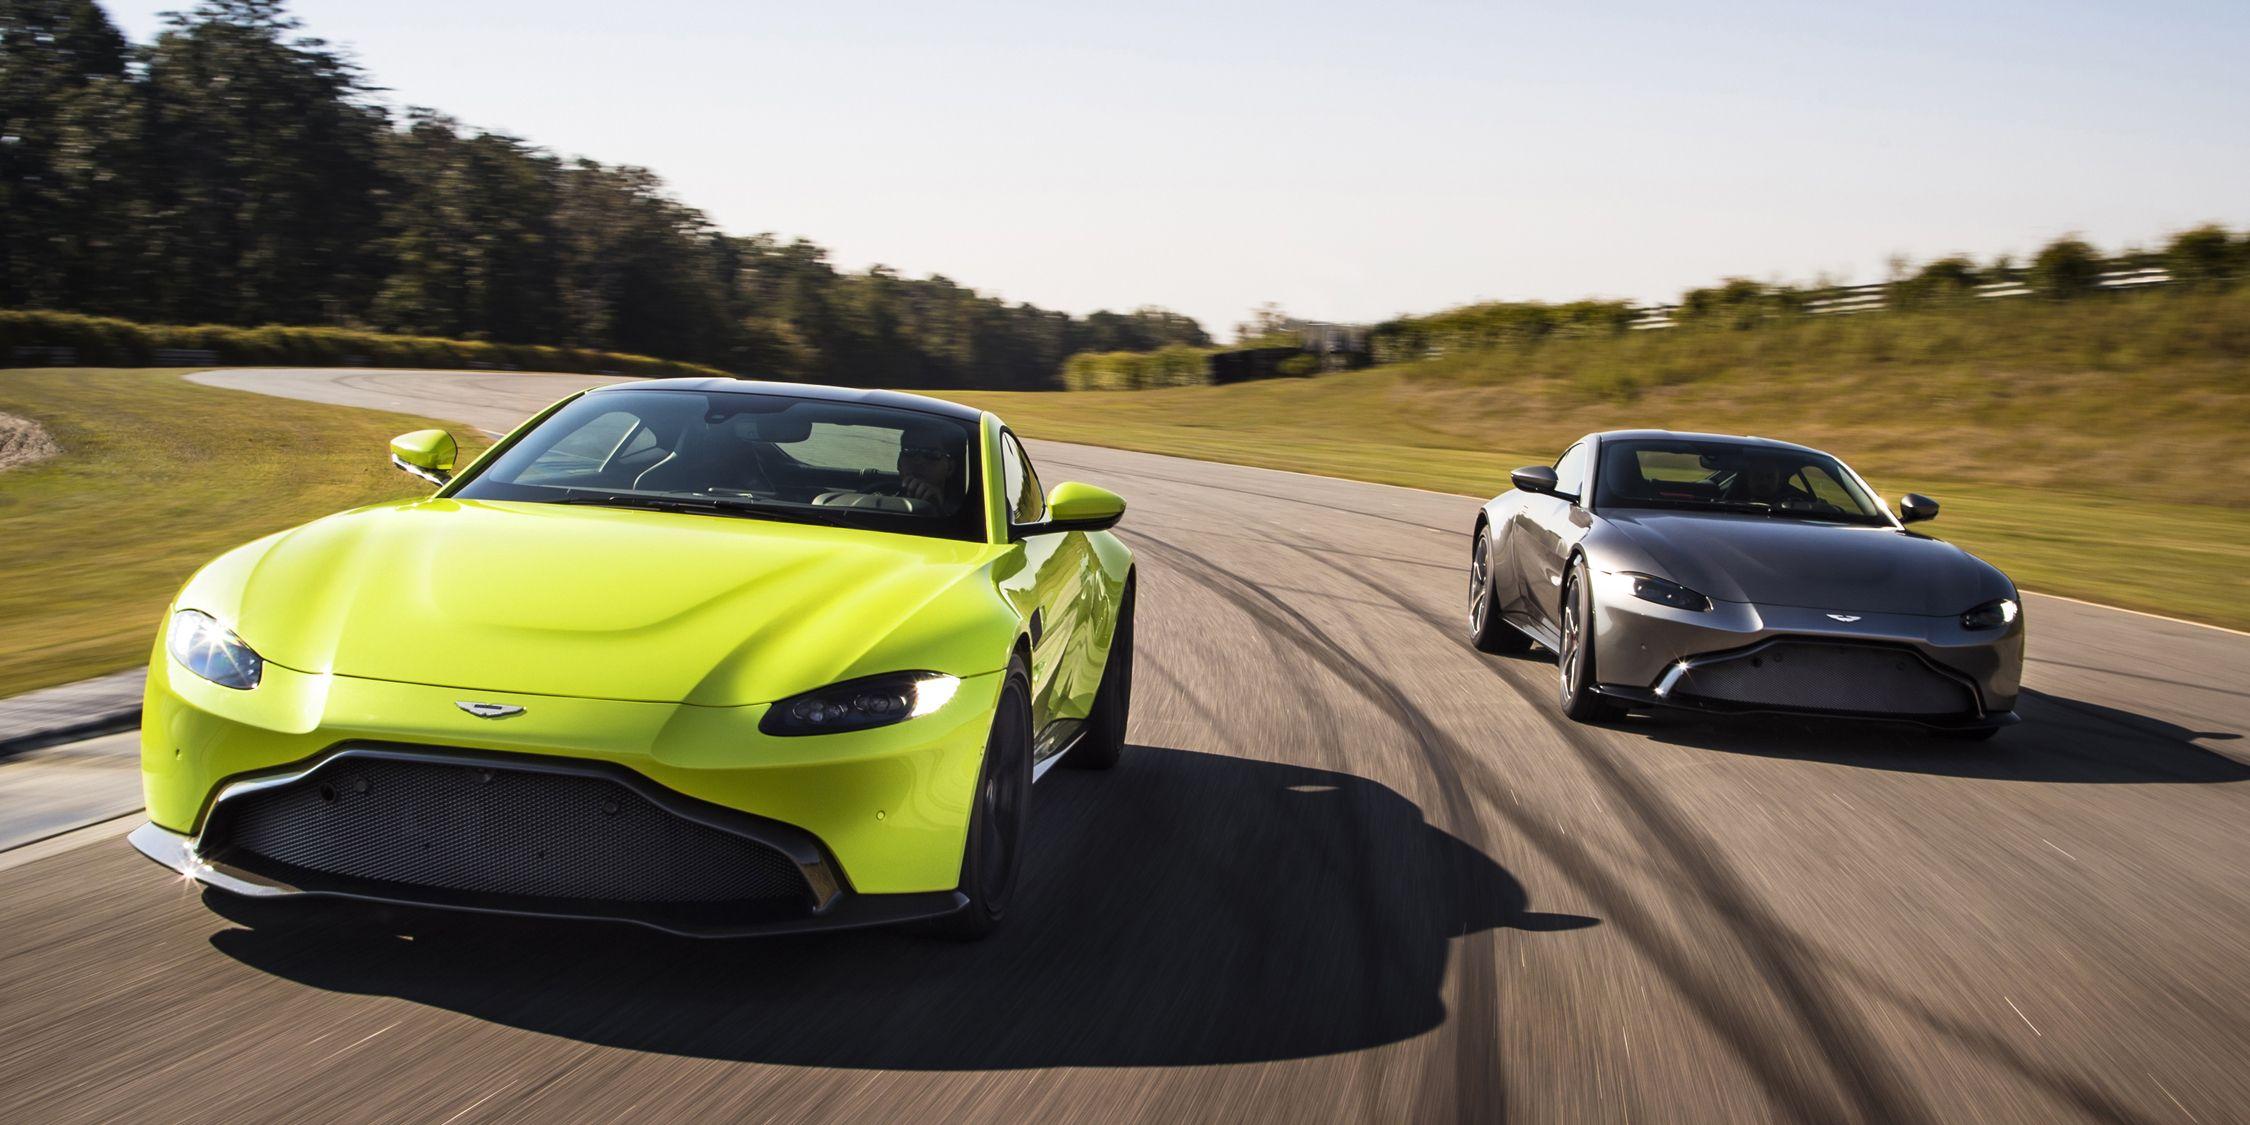 2019 Aston Martin Vantage Unveiled It S Stunning News Car And